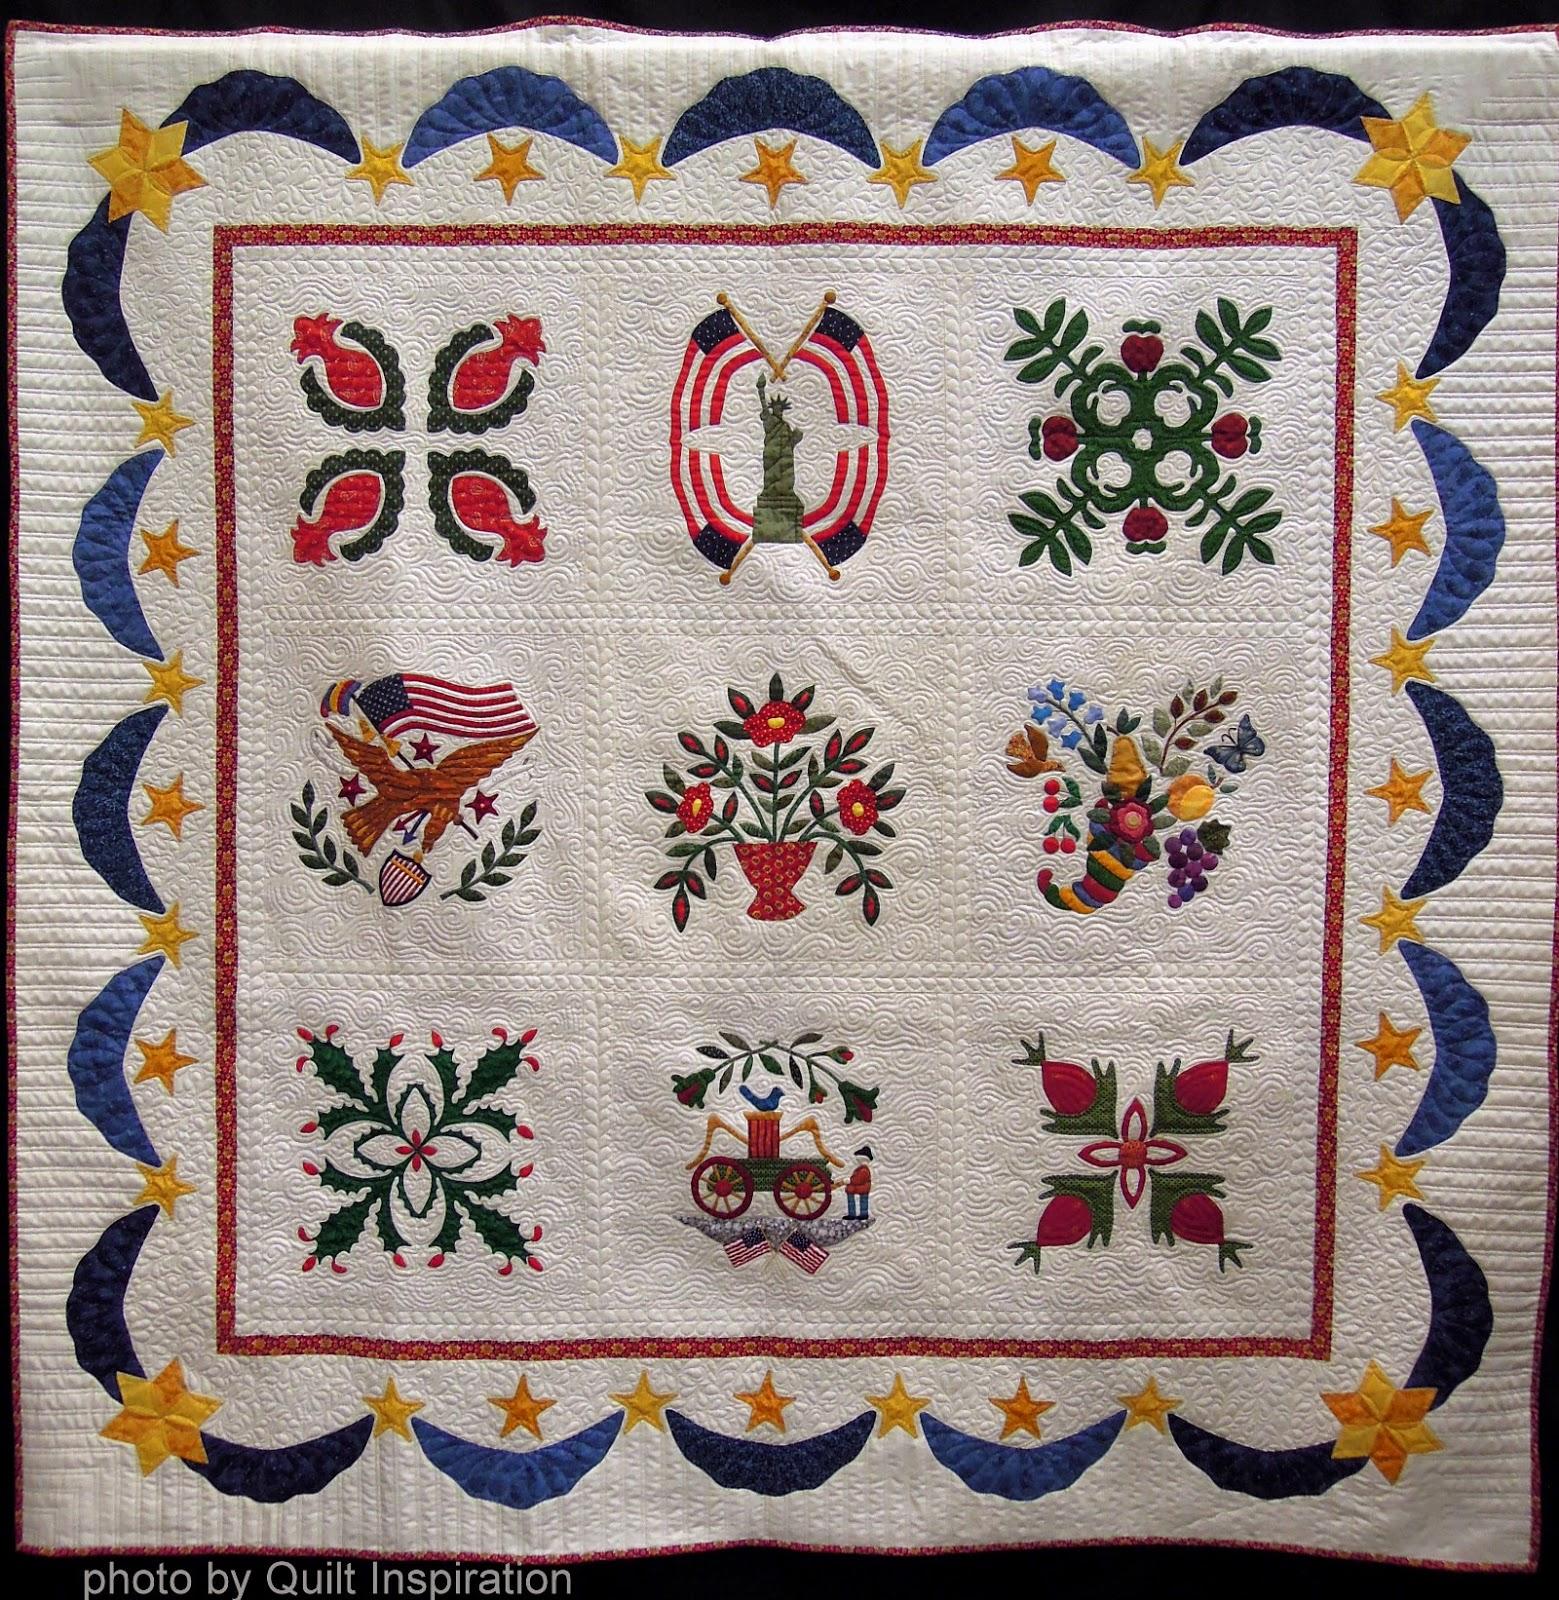 Quilt Inspiration: Baltimore Album Quilt of Remembrance : baltimore christmas quilt pattern - Adamdwight.com